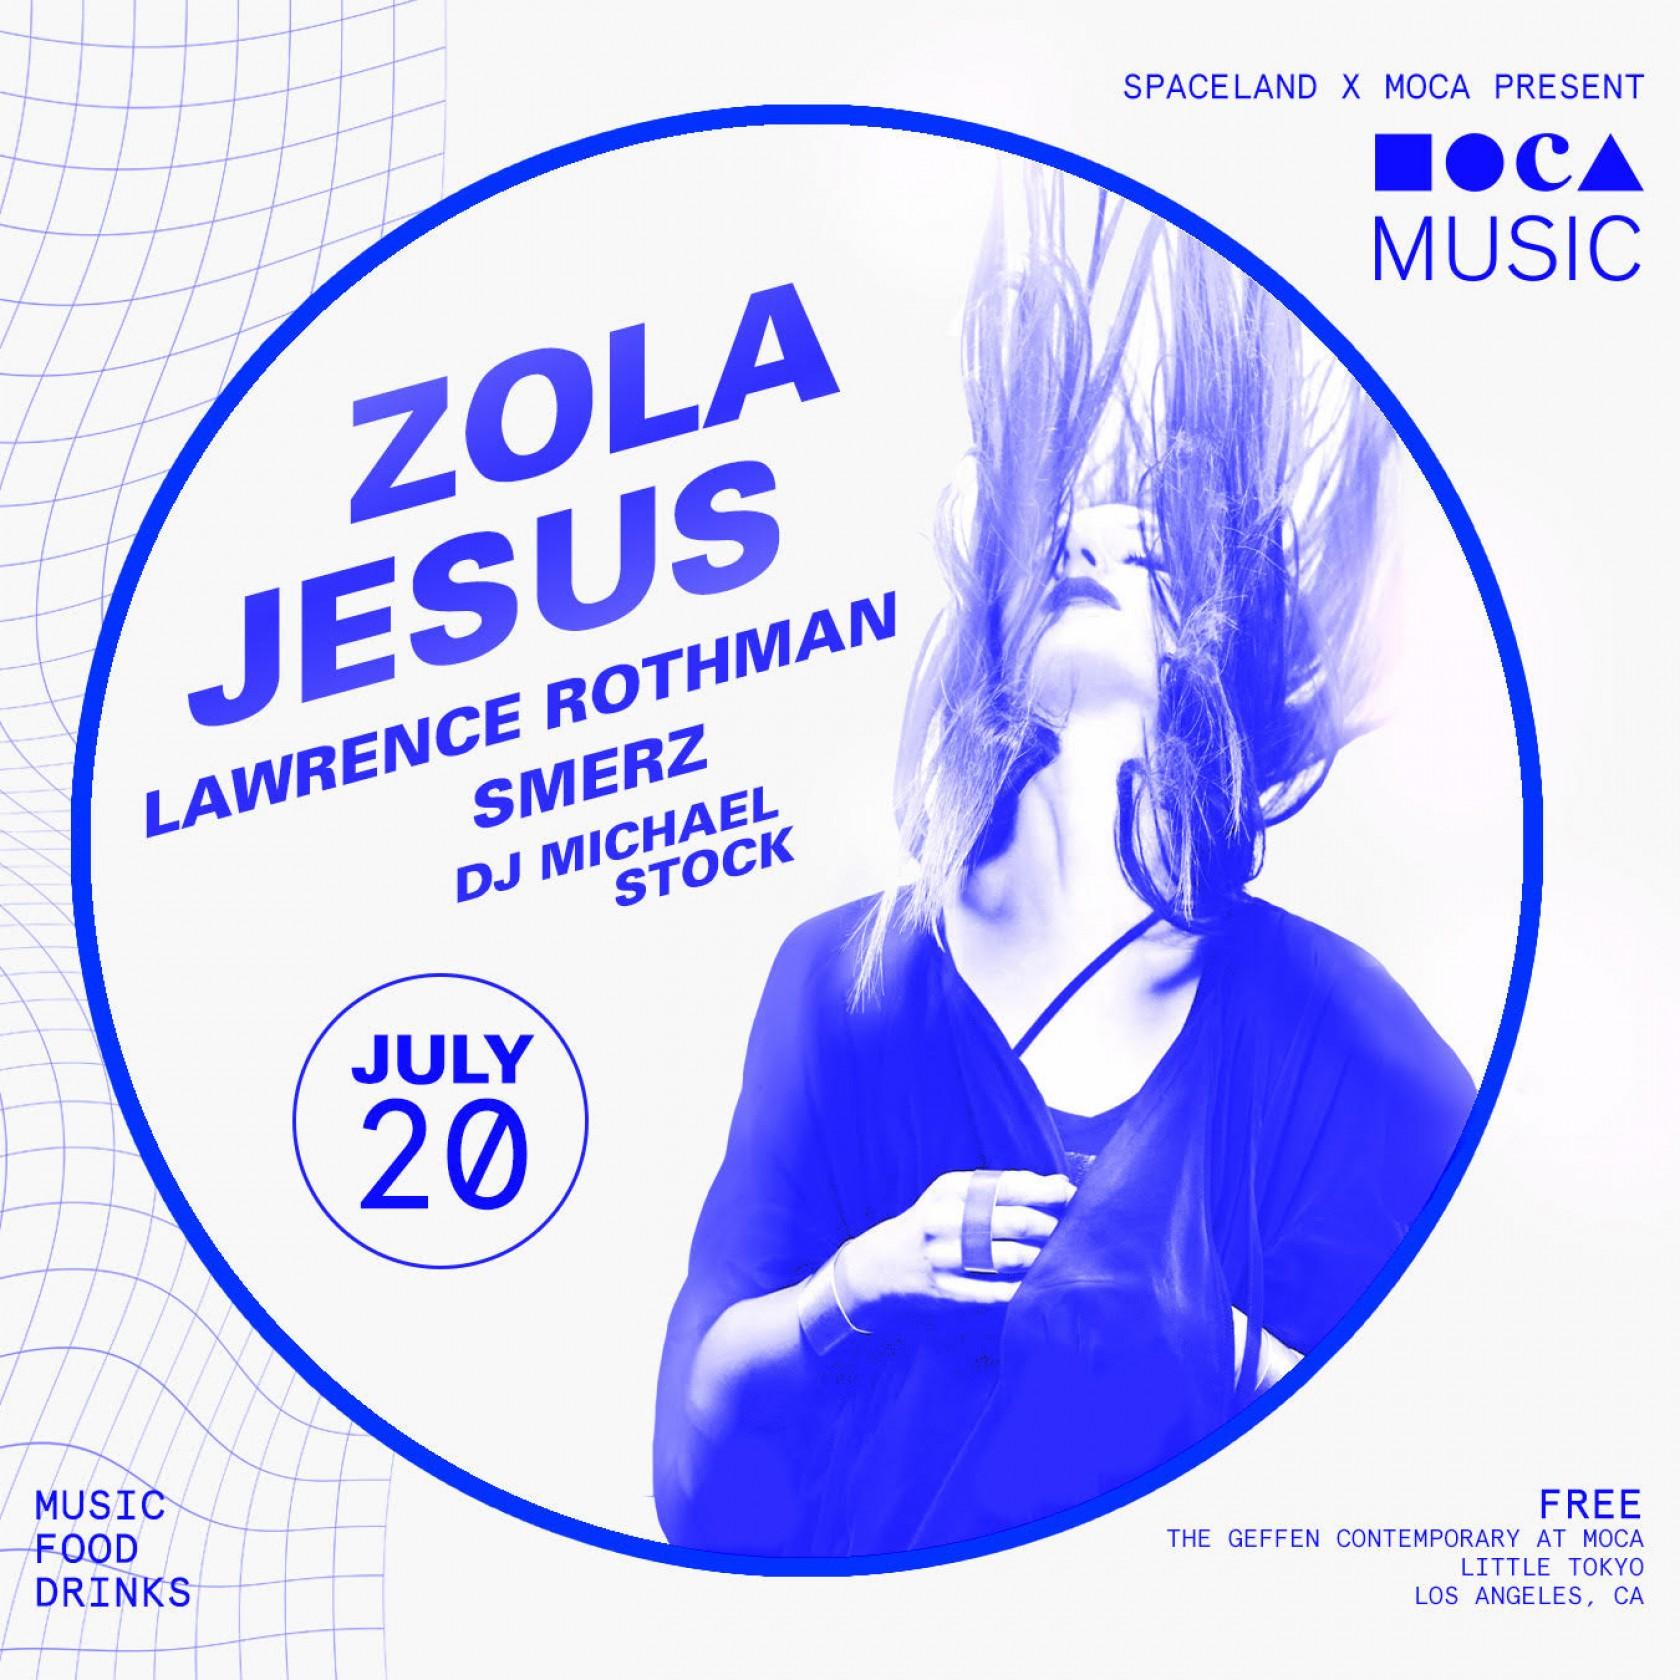 MOCA Music  Zola Jesus w  Lawrence Rothman 2b2f793bc87dc